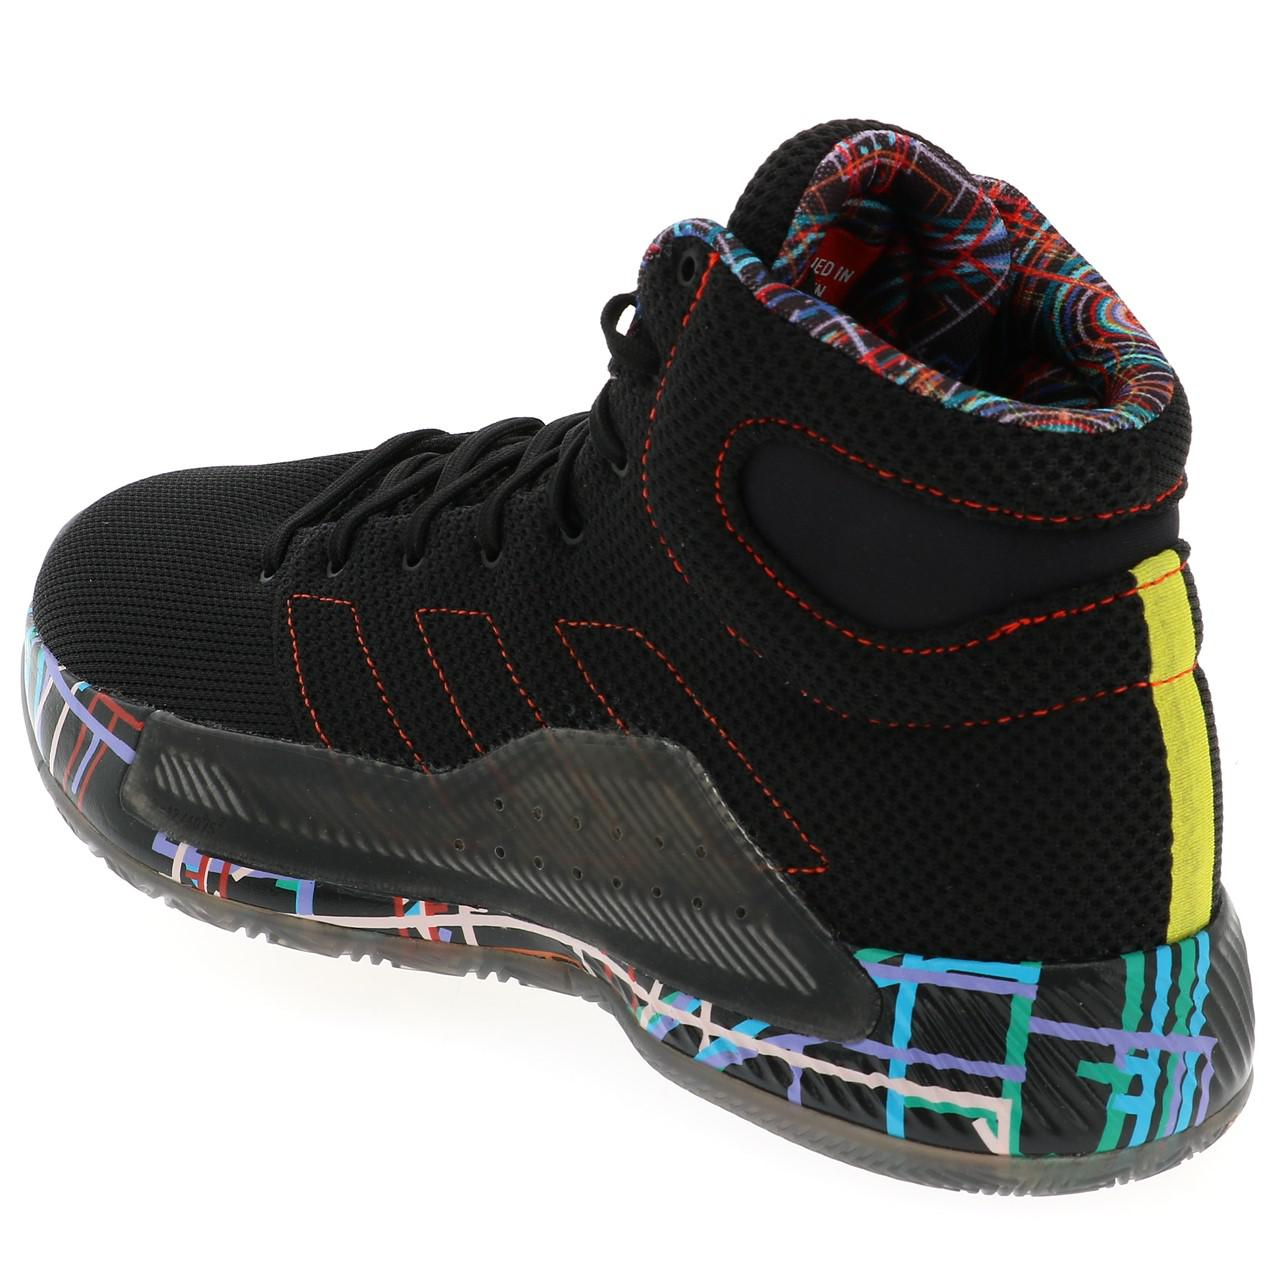 Chaussures-basket-Adidas-Pro-bounce-madness-basket-Noir-55022-Neuf miniature 3